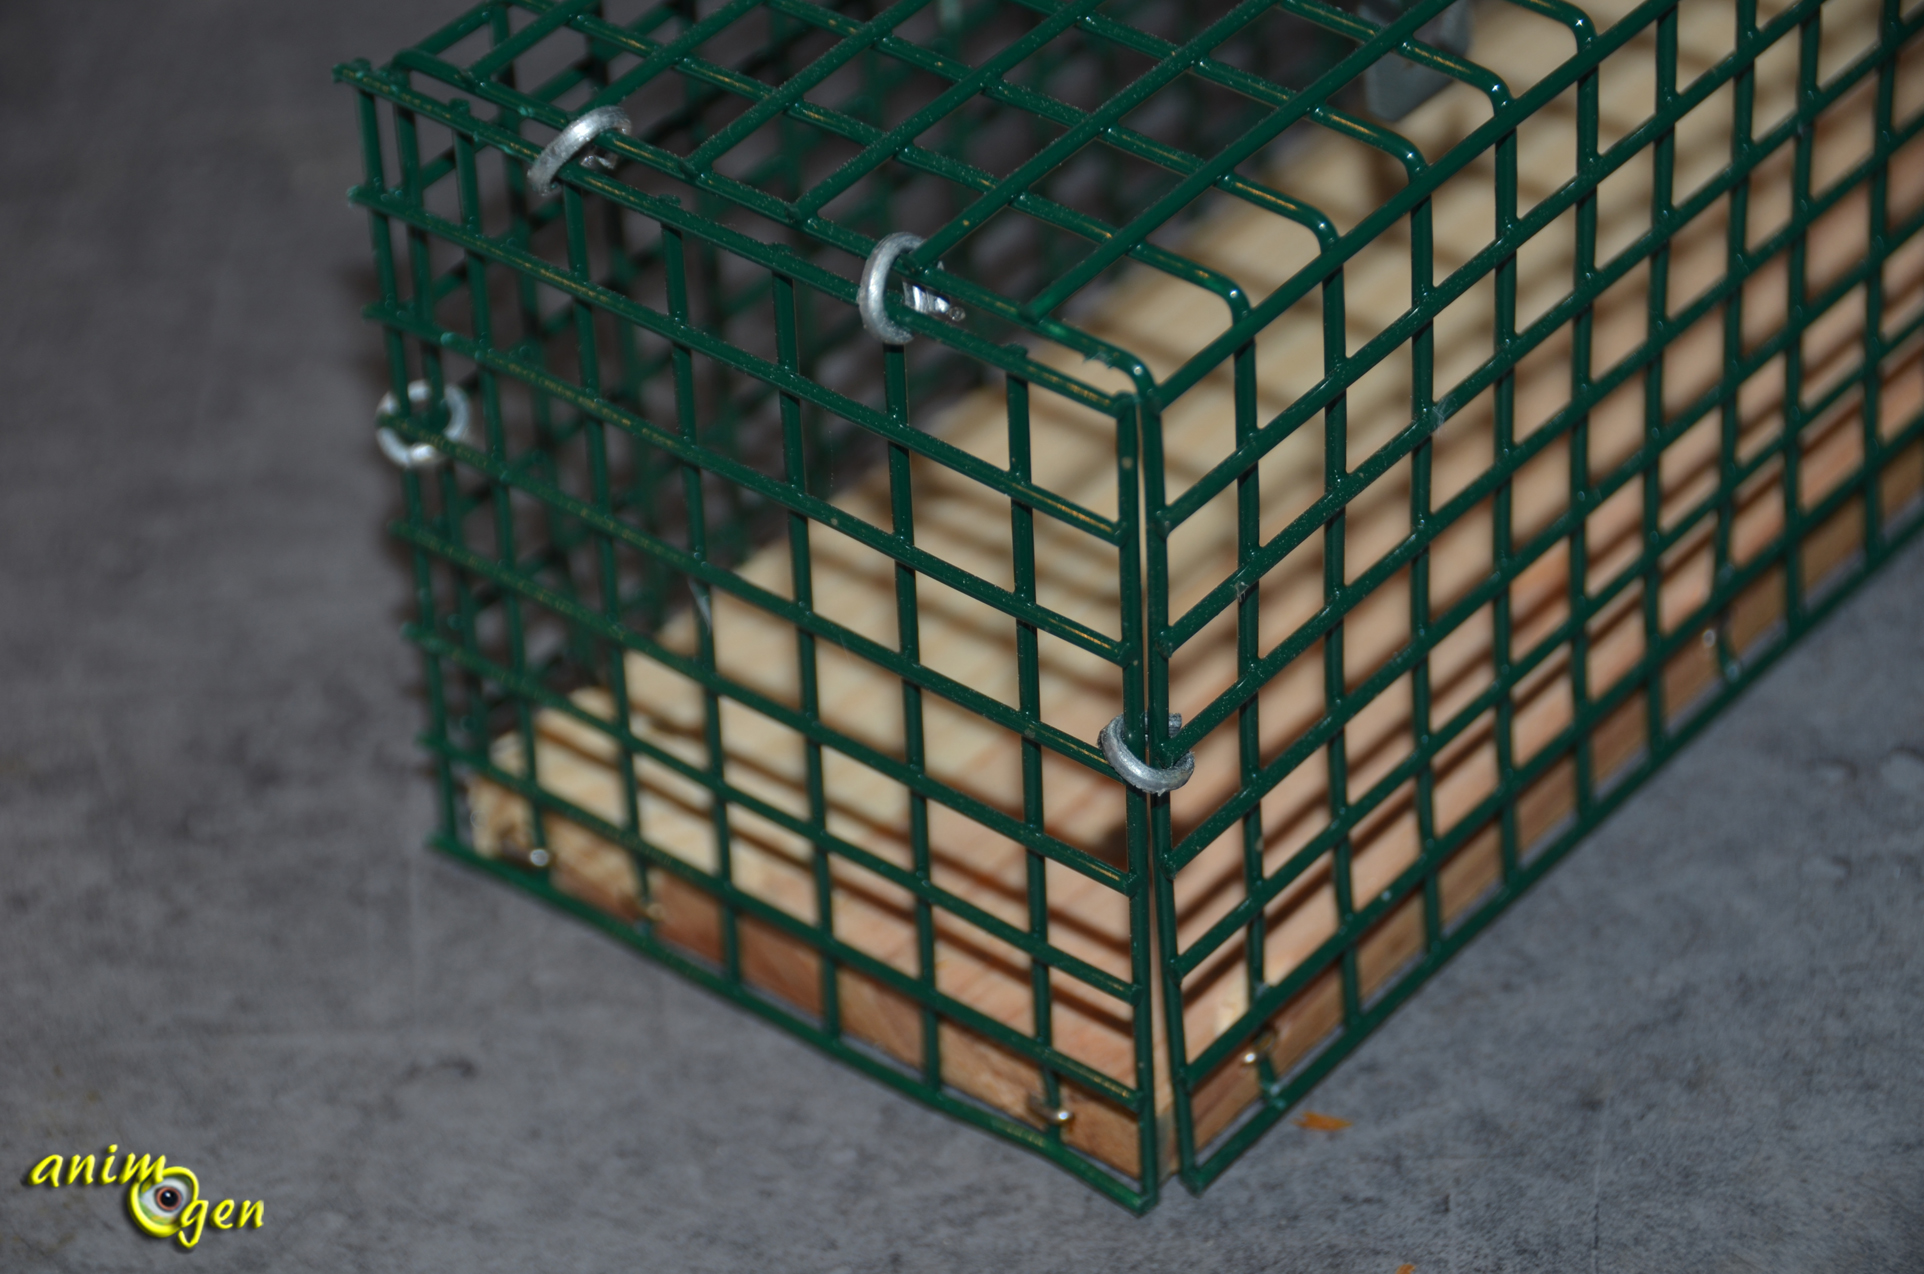 Tuer des rats free boutique rats with tuer des rats - Comment attraper un rat ...